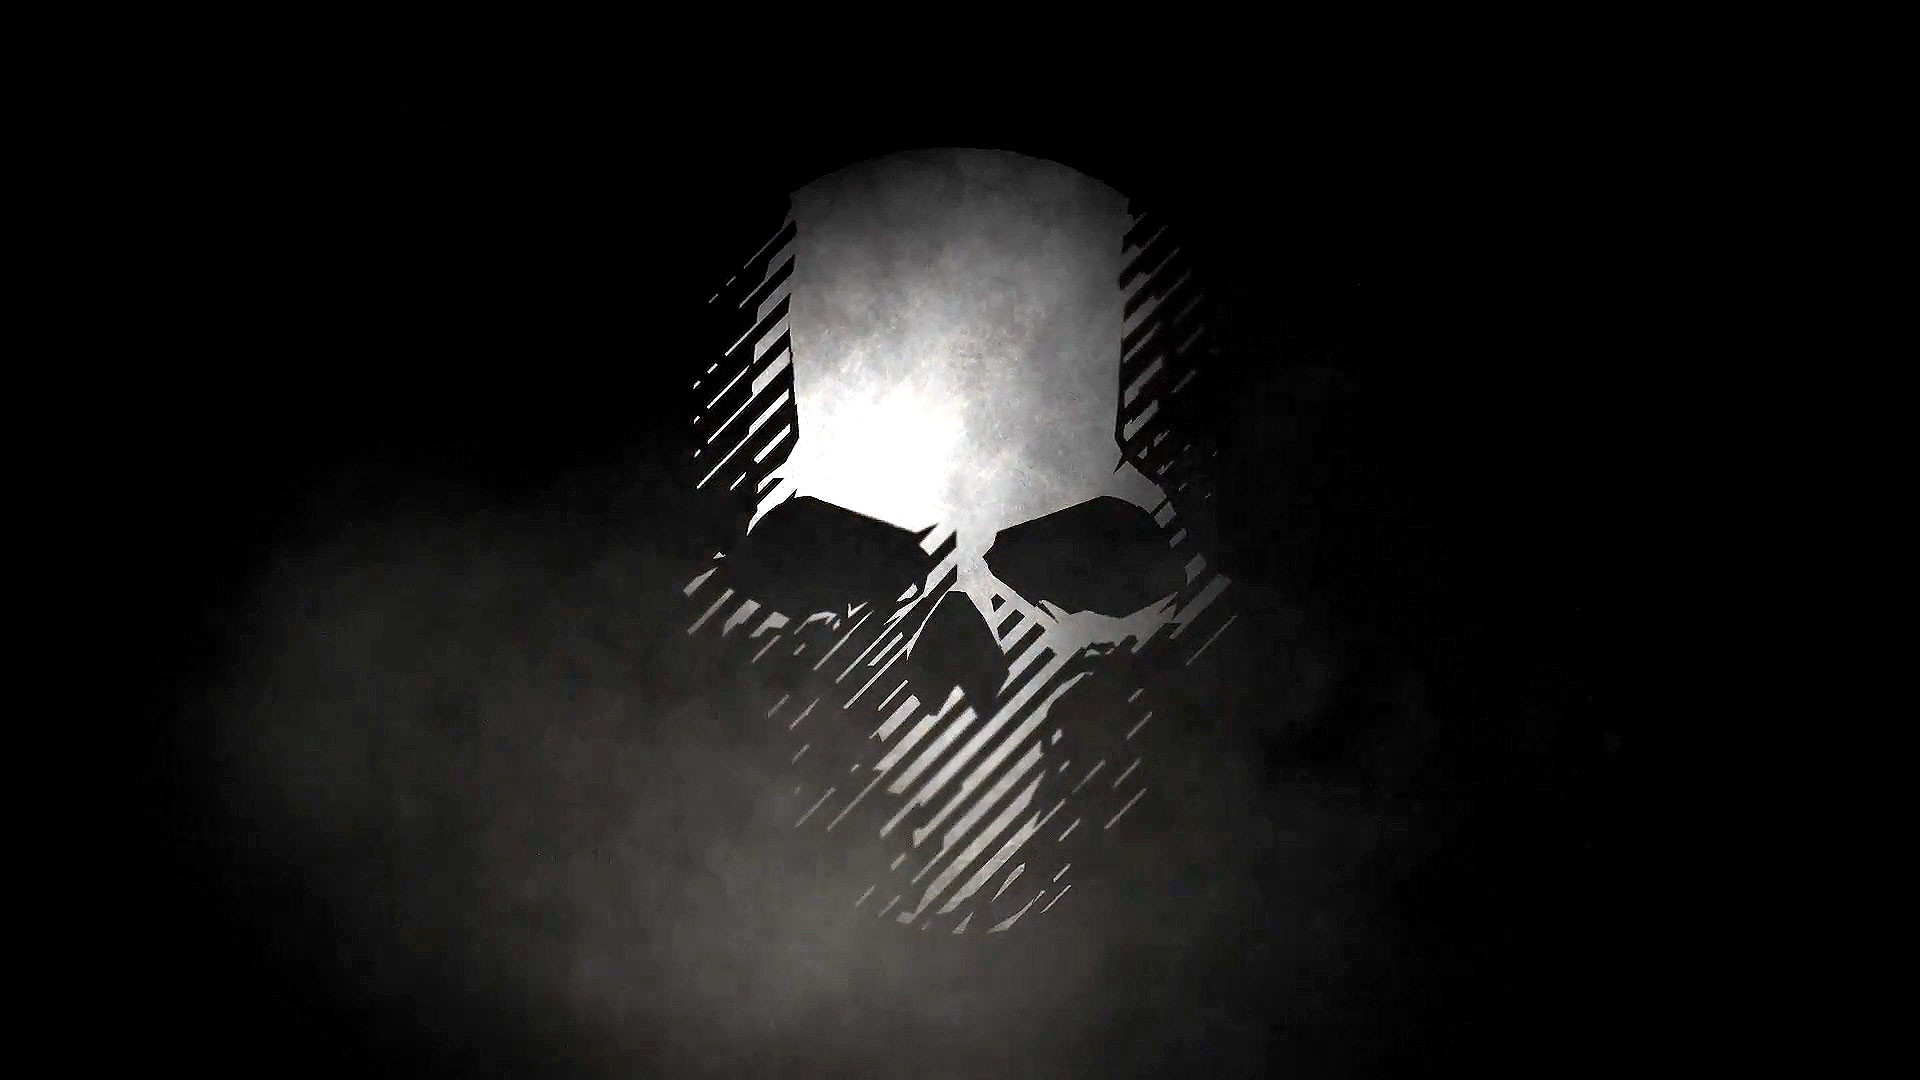 Skulls Wallpaper (58+ images)